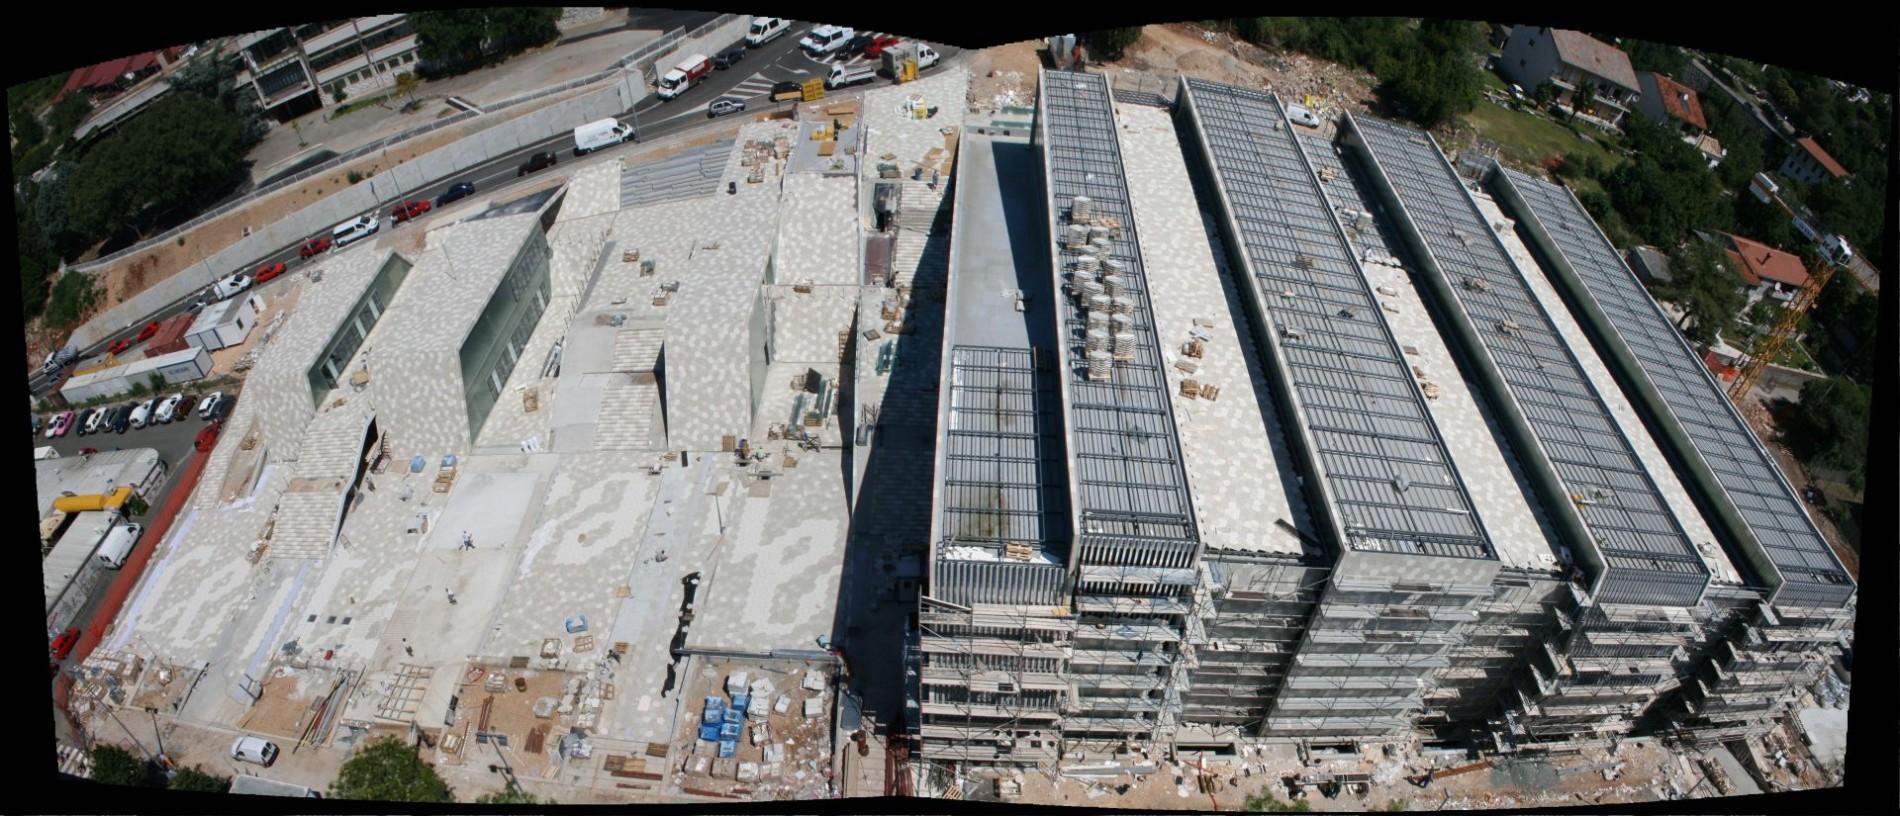 zamet, beton, upi-2m